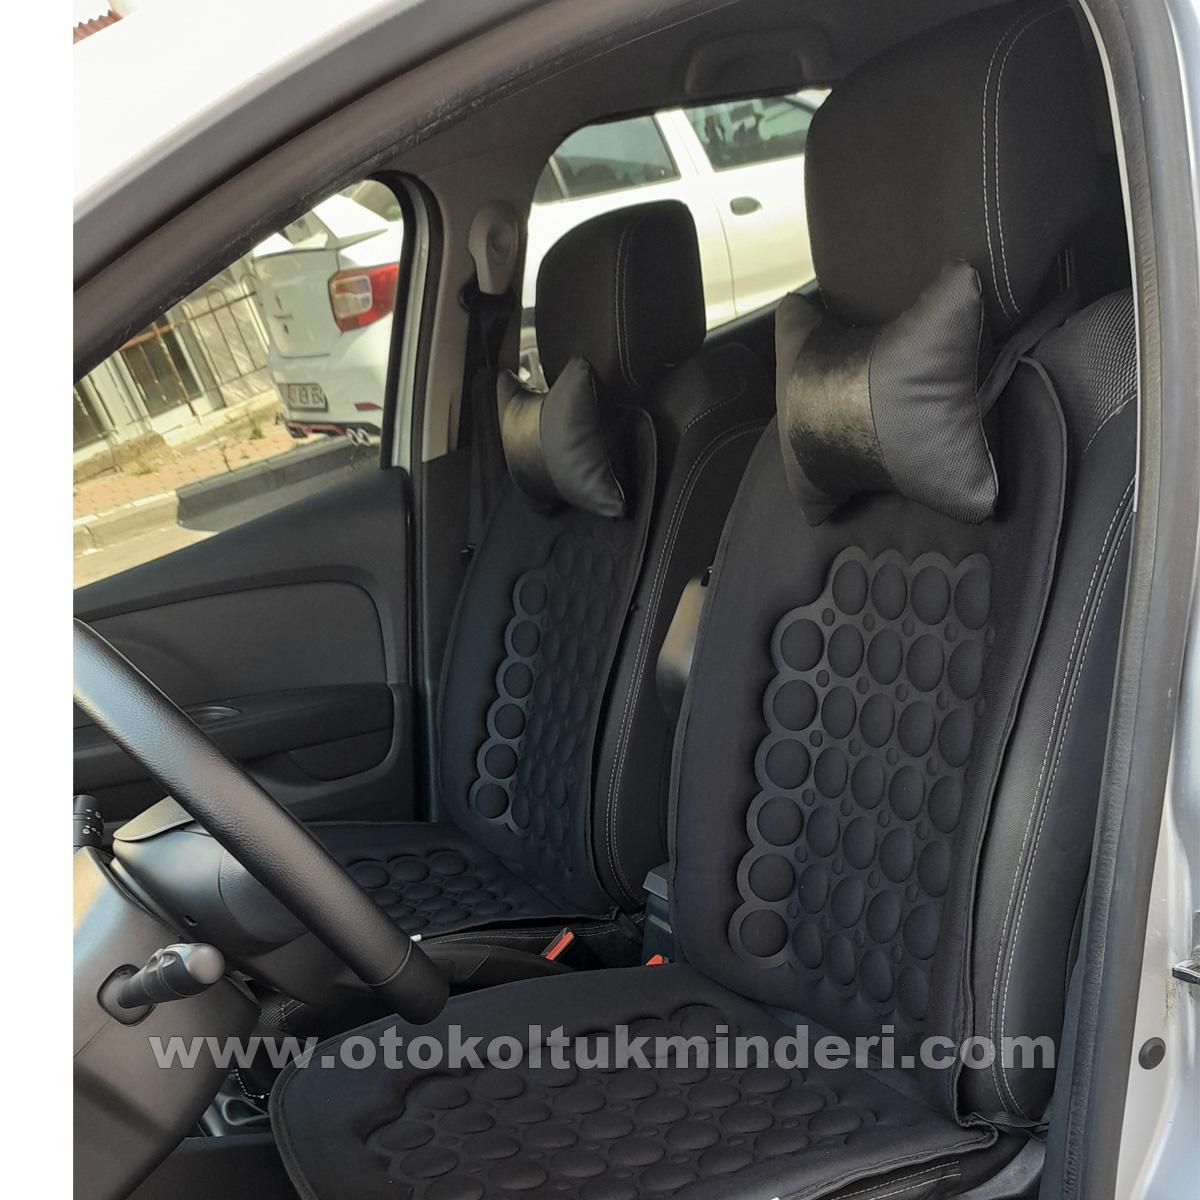 Fiat koltuk minderi - Honda uyumlu koltuk minderi